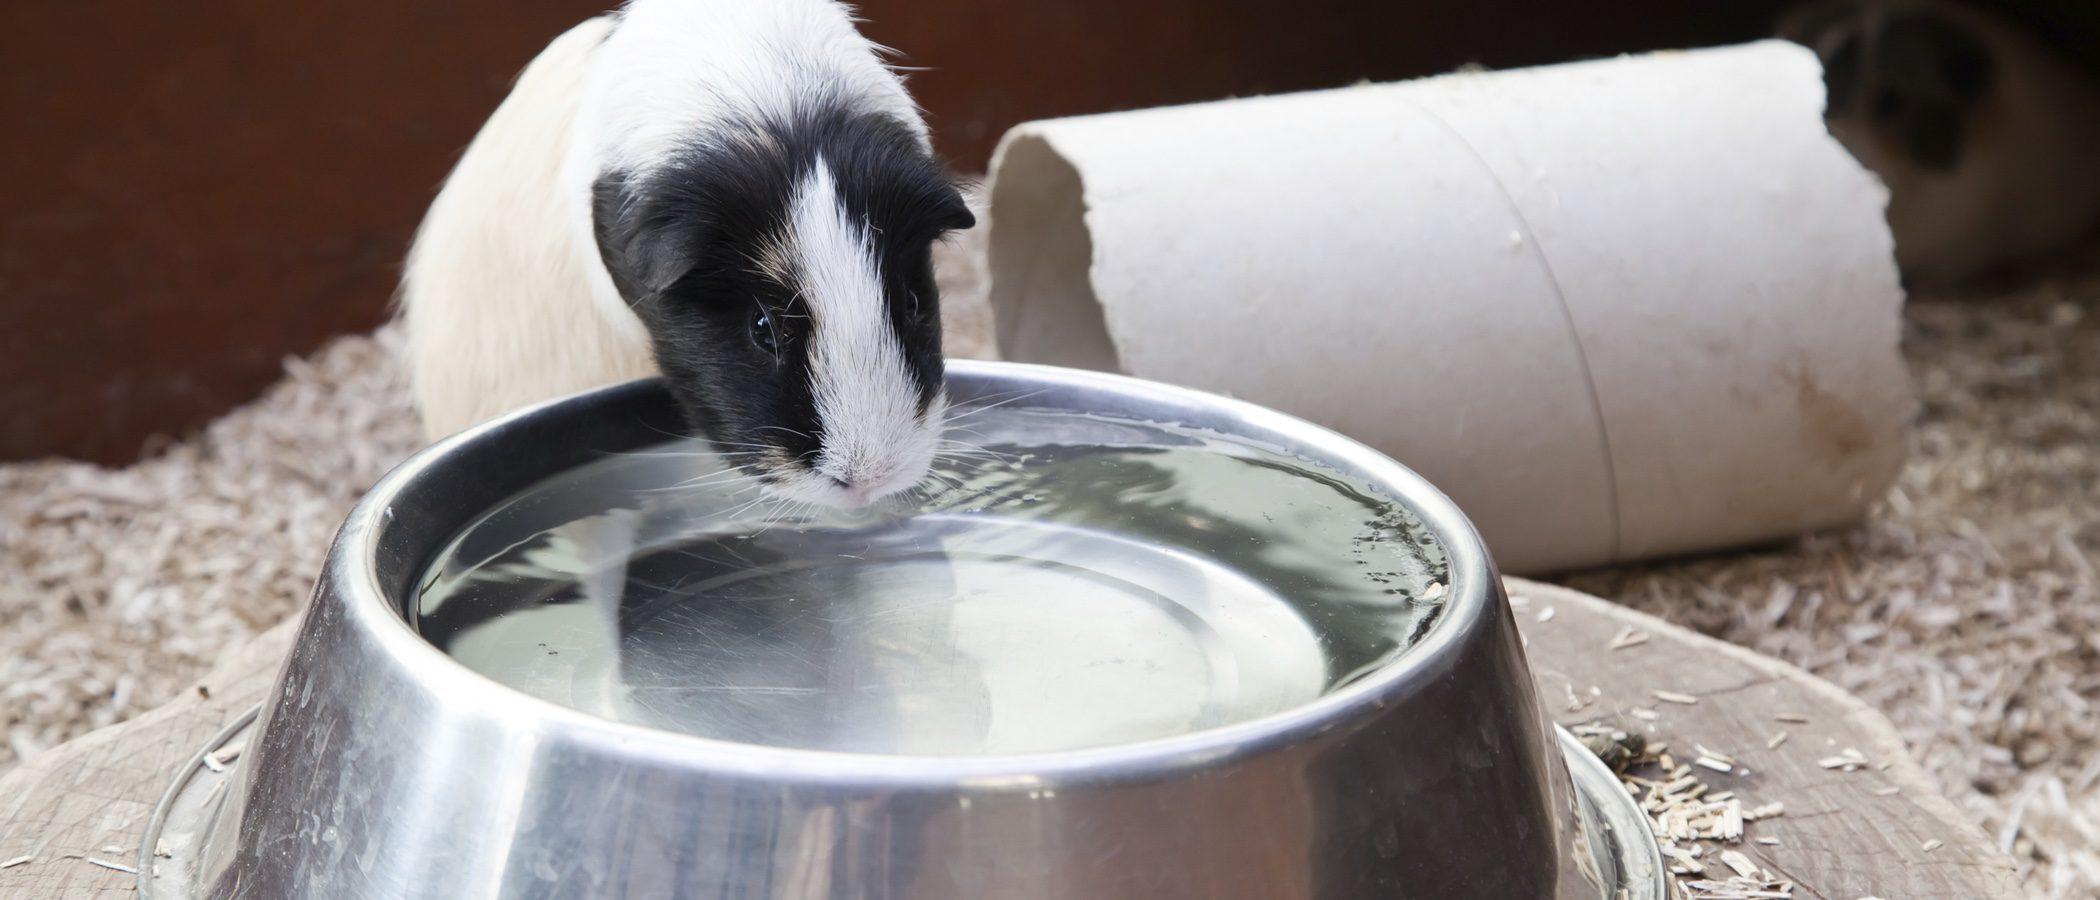 ¿Cuánta agua debe beber un hámster?